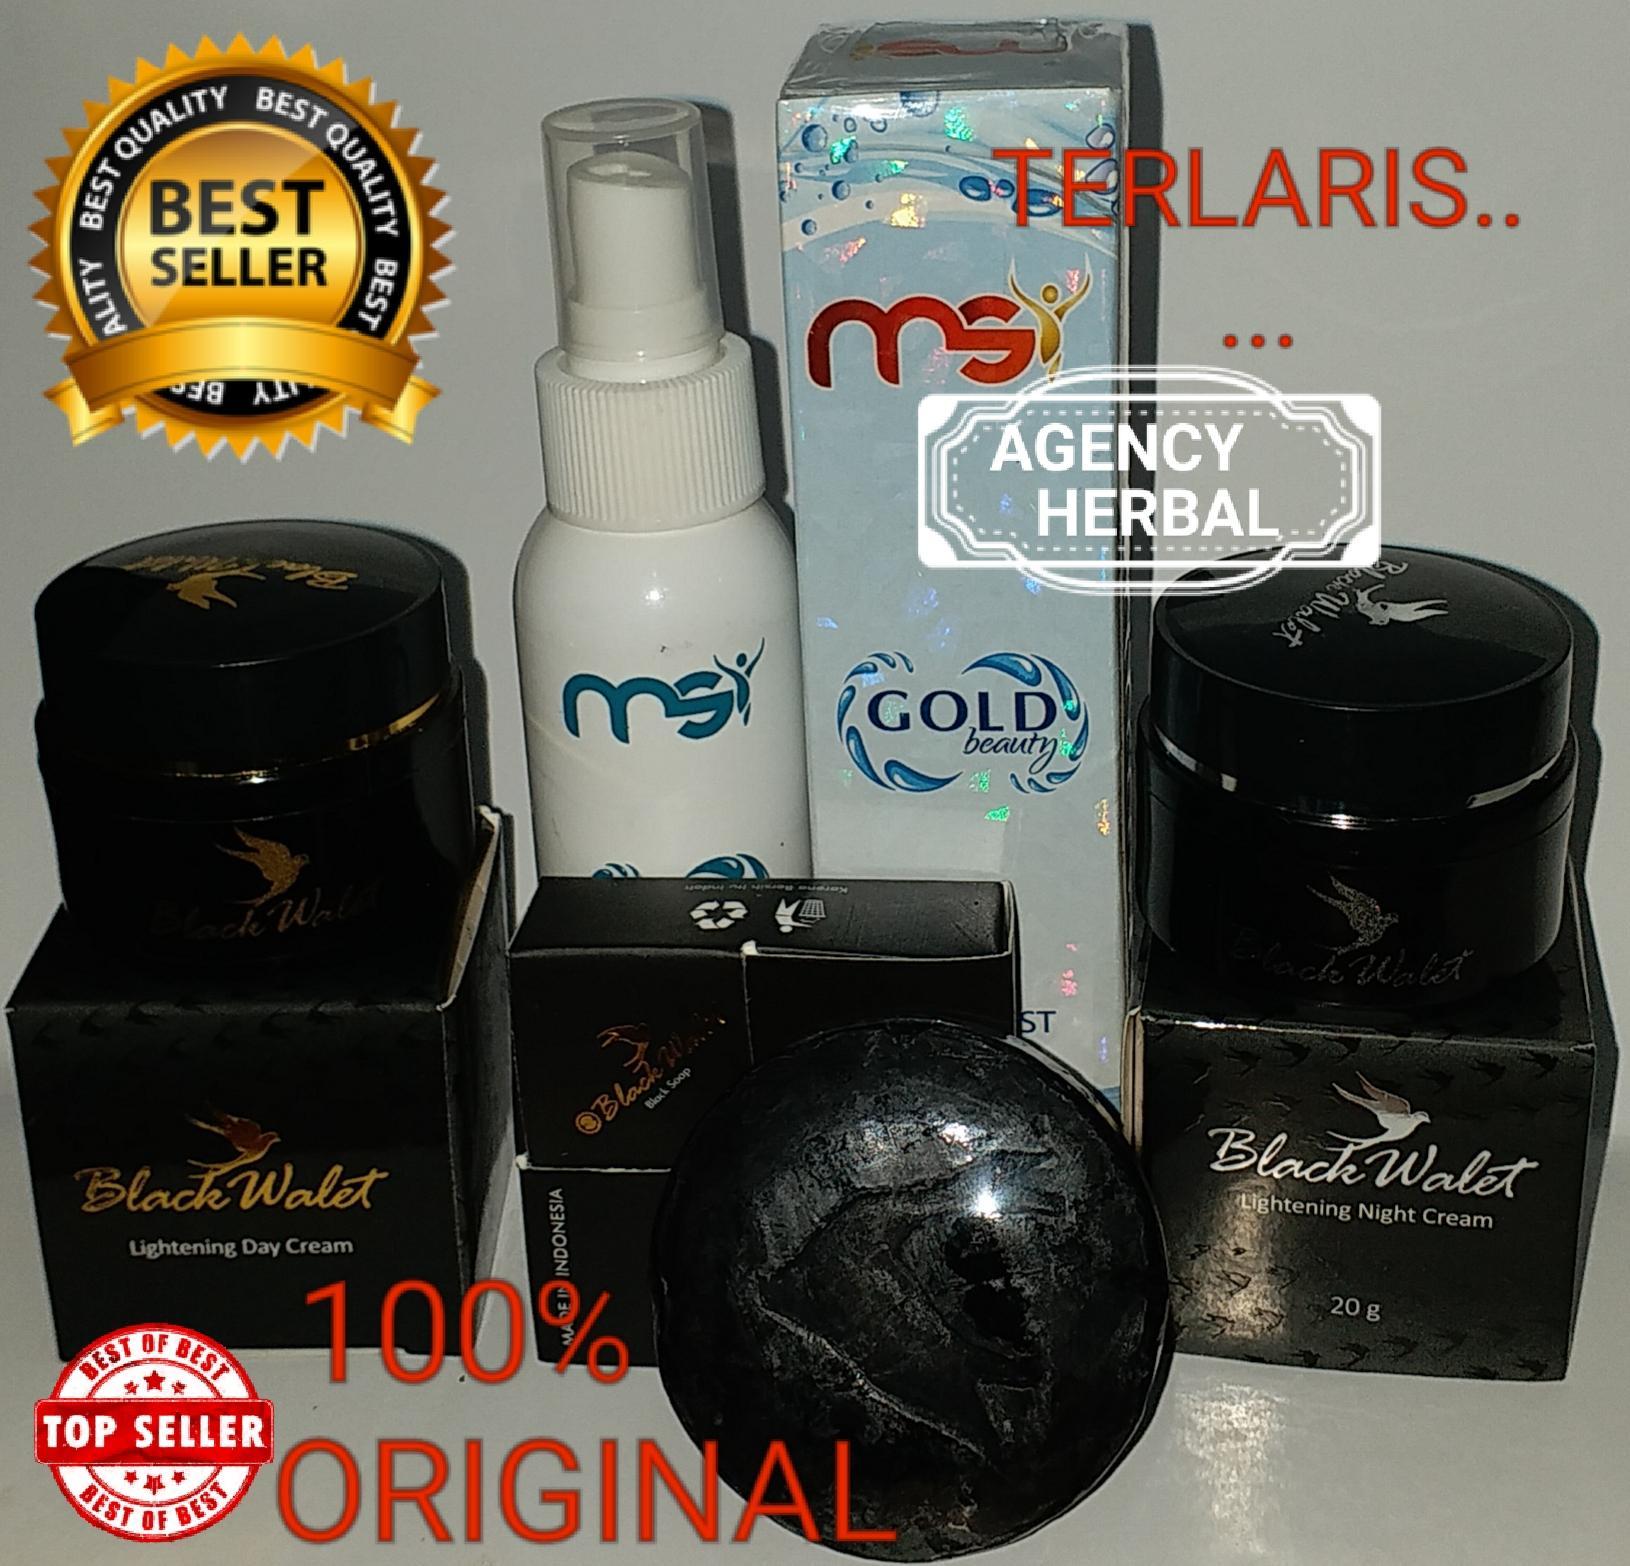 Kehebatan Paket Msi Face Mist Sabun Bamboo Charcoal Dan Harga Update Original Asli Cream Walet Day Night Ori